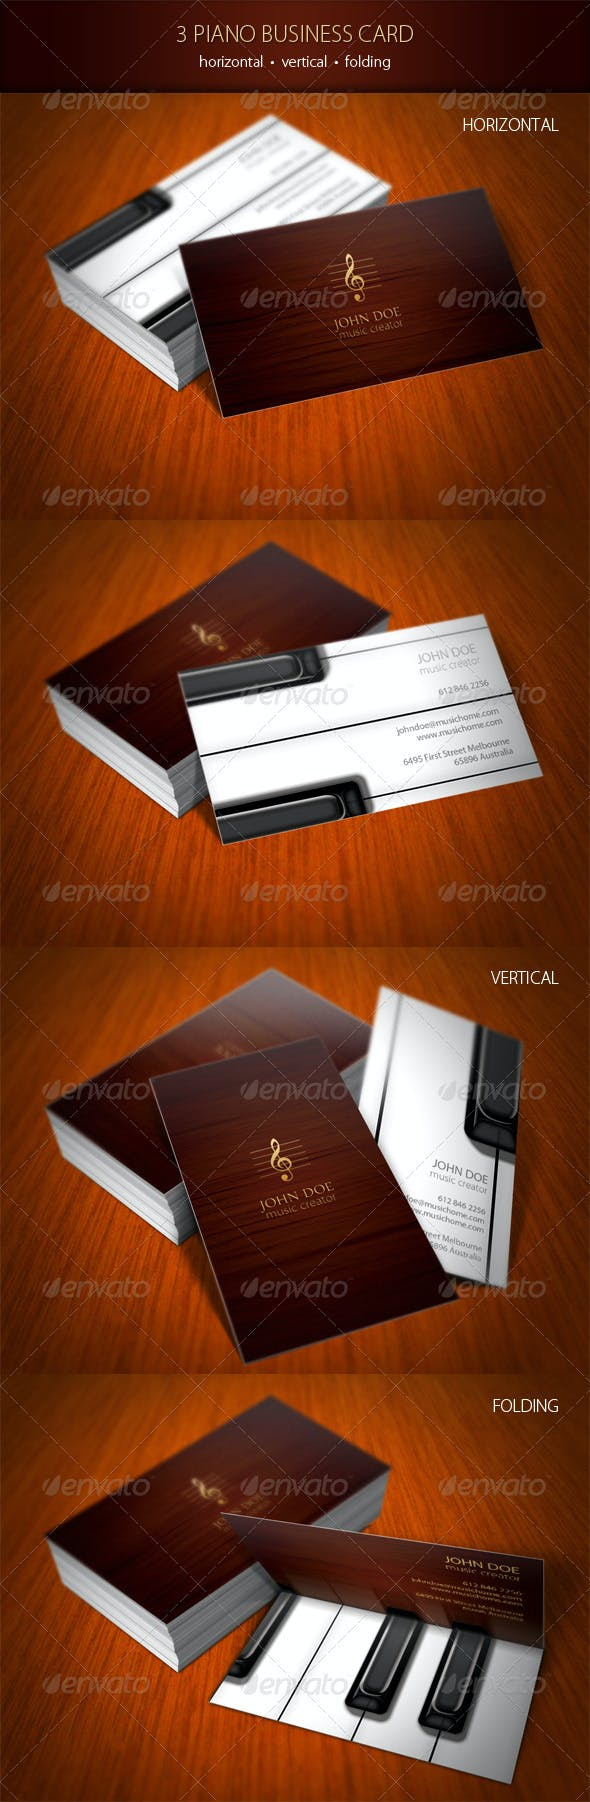 3 Piano Business Card By Progmatika Graphicriver